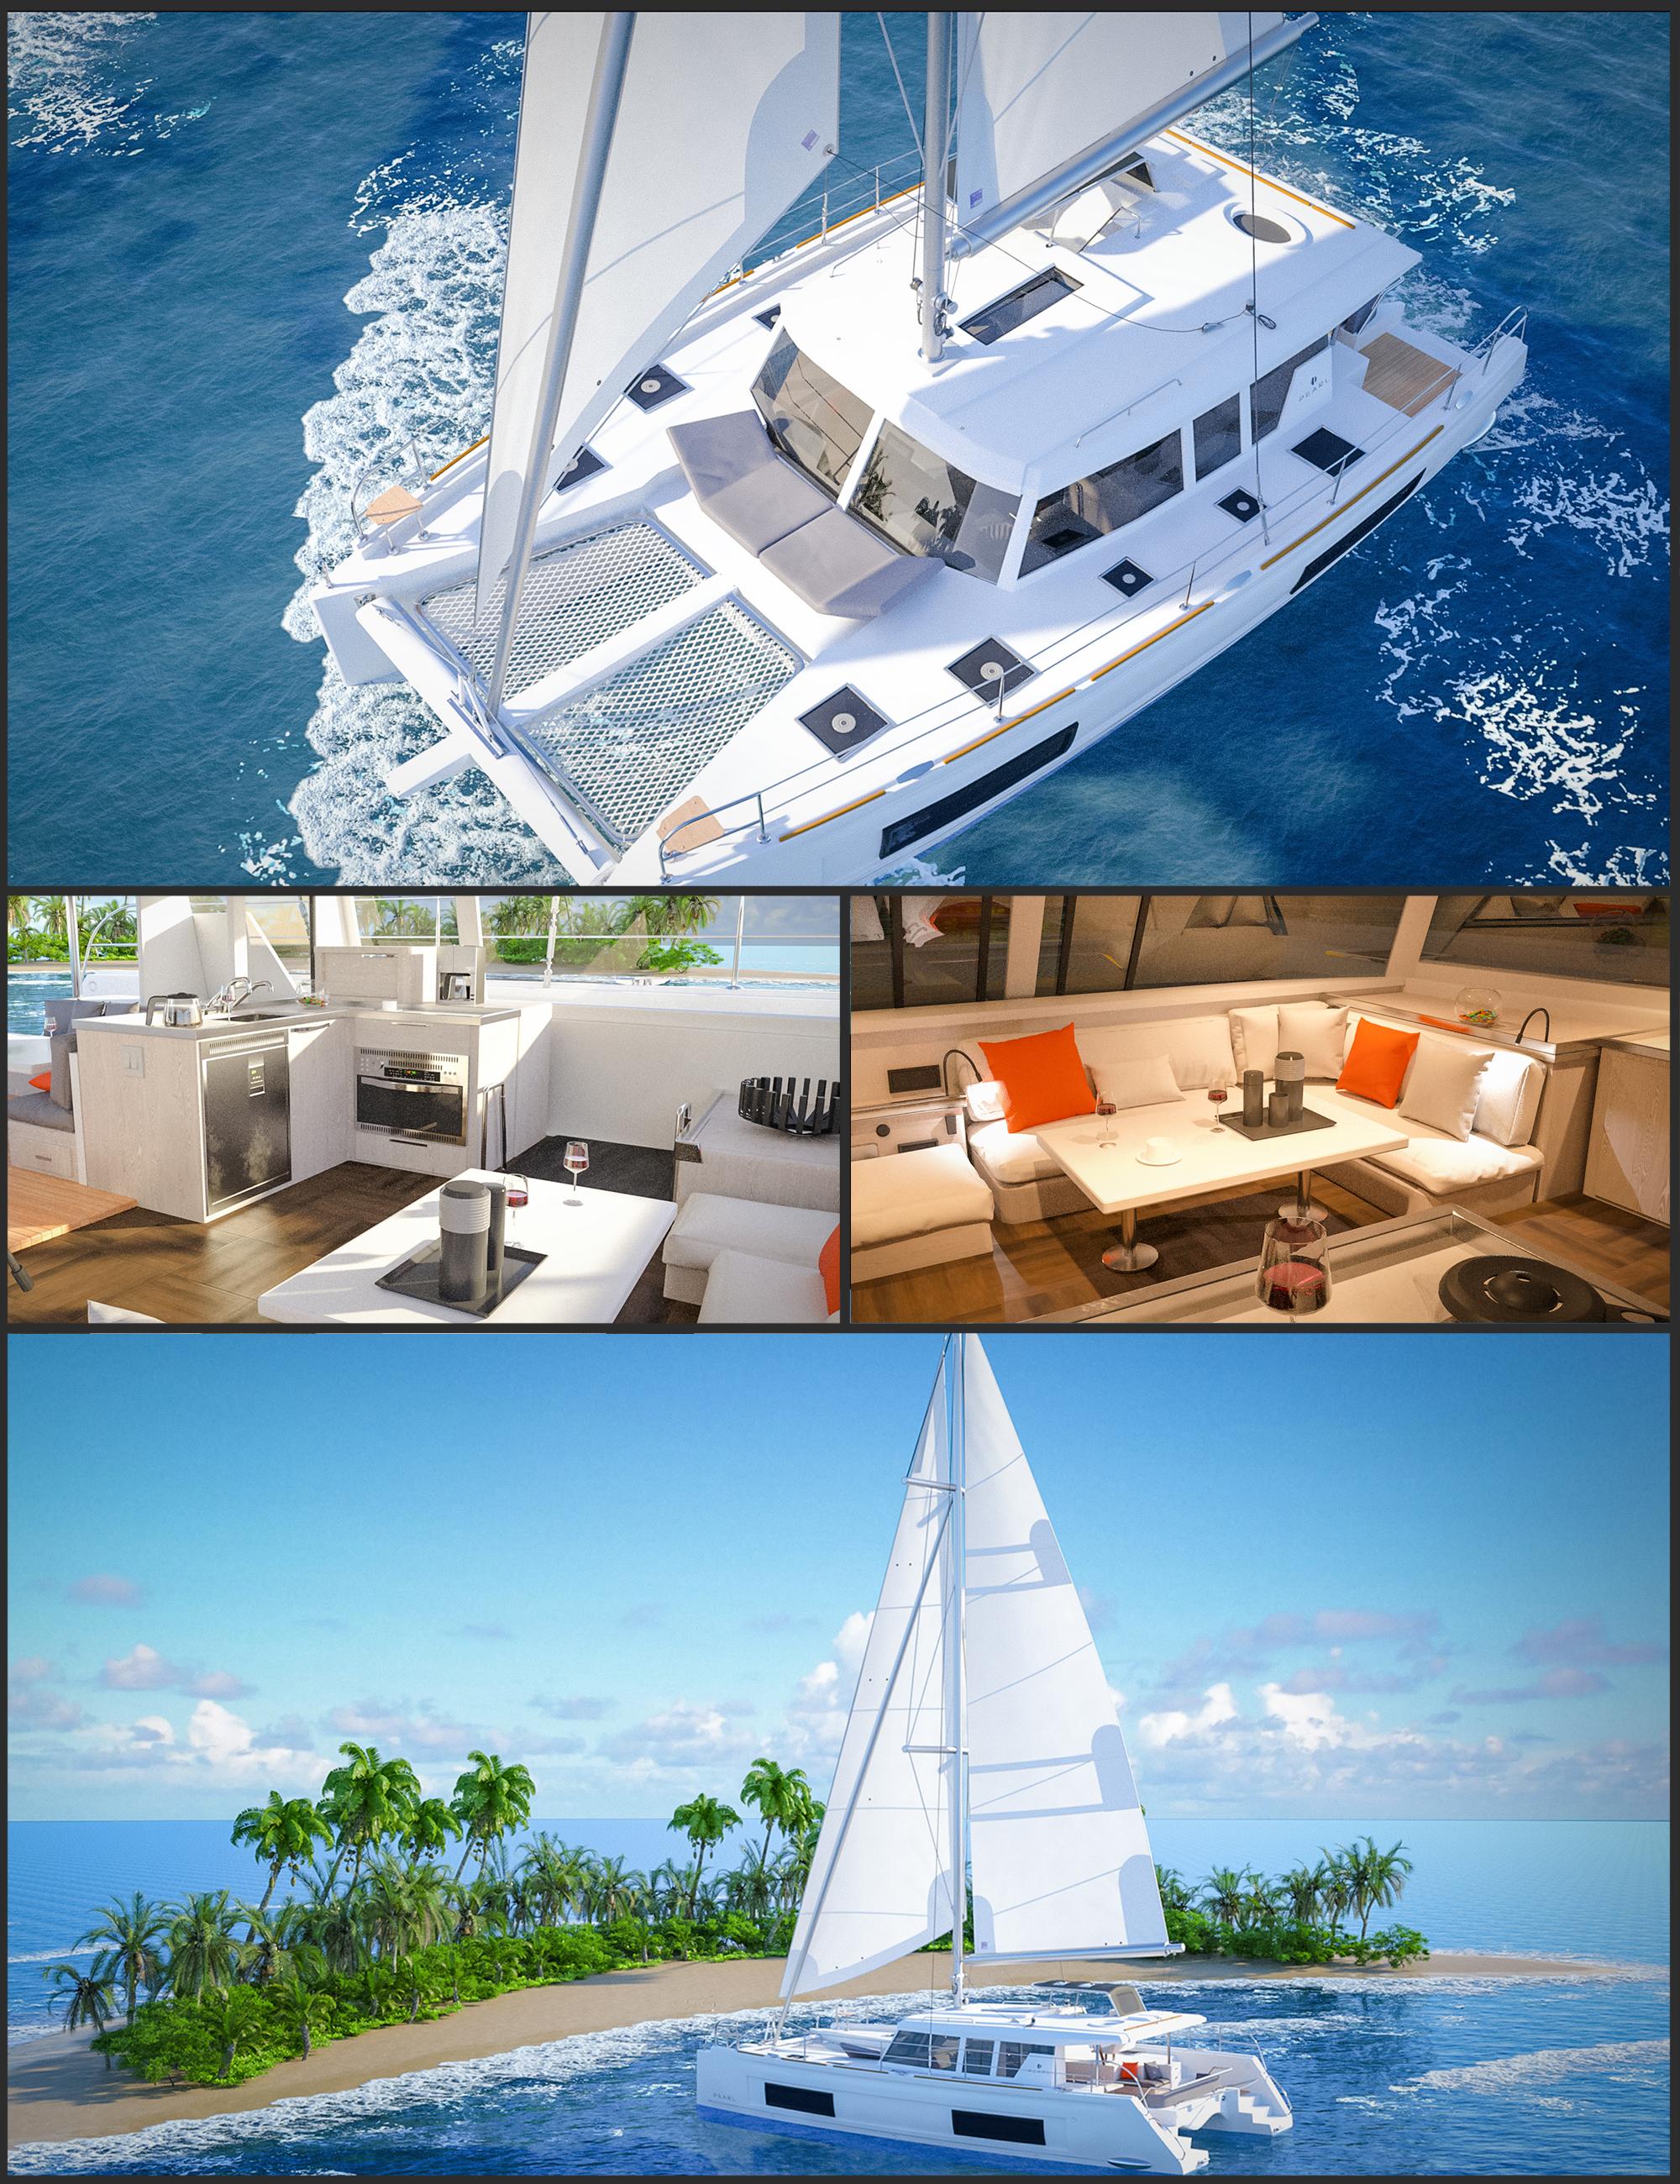 Glowing Beach Sailboat by: Polish, 3D Models by Daz 3D